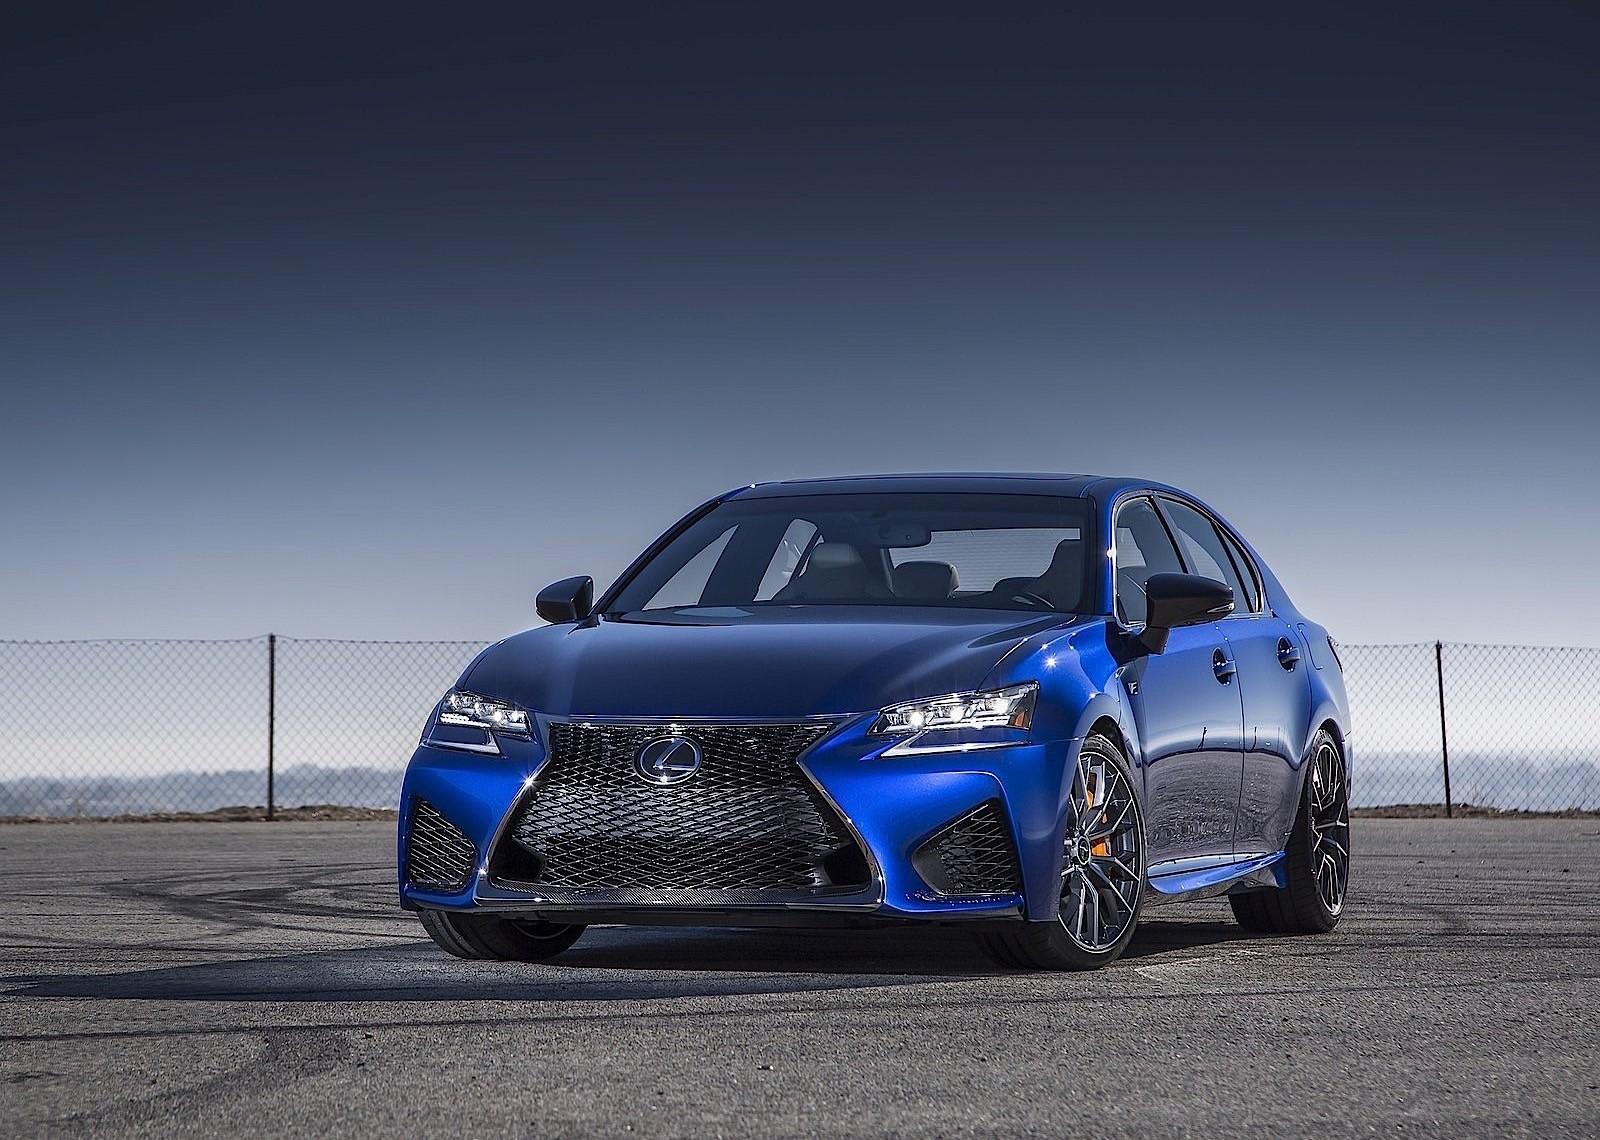 Lexus Gs F >> LEXUS GS F specs & photos - 2015, 2016, 2017, 2018, 2019 ...